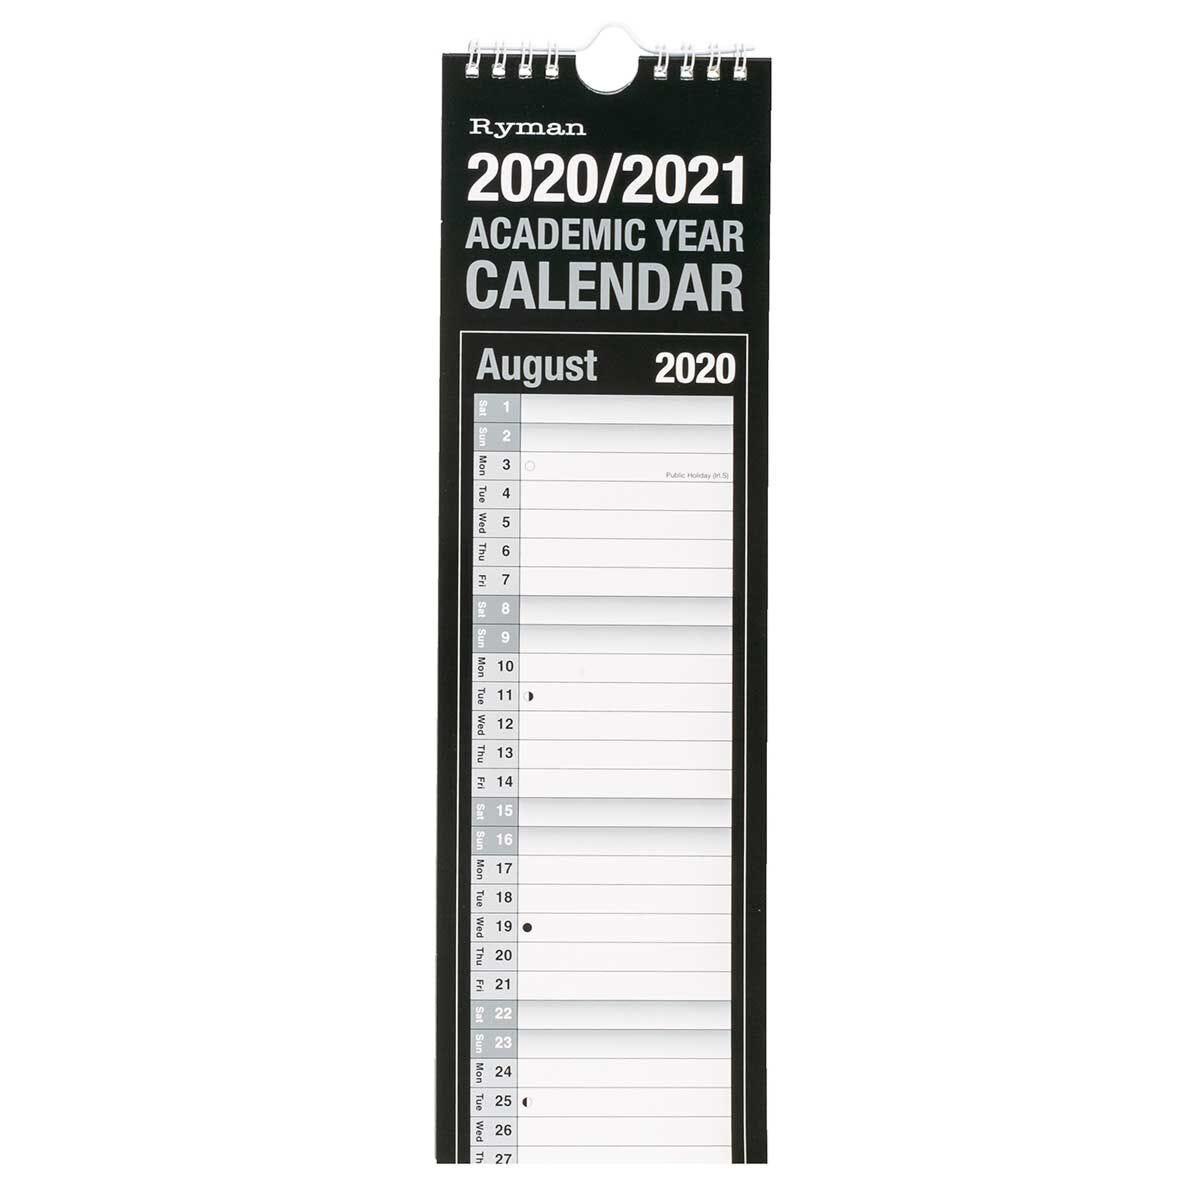 Ryman Academic Calendar Slim 2020-2021